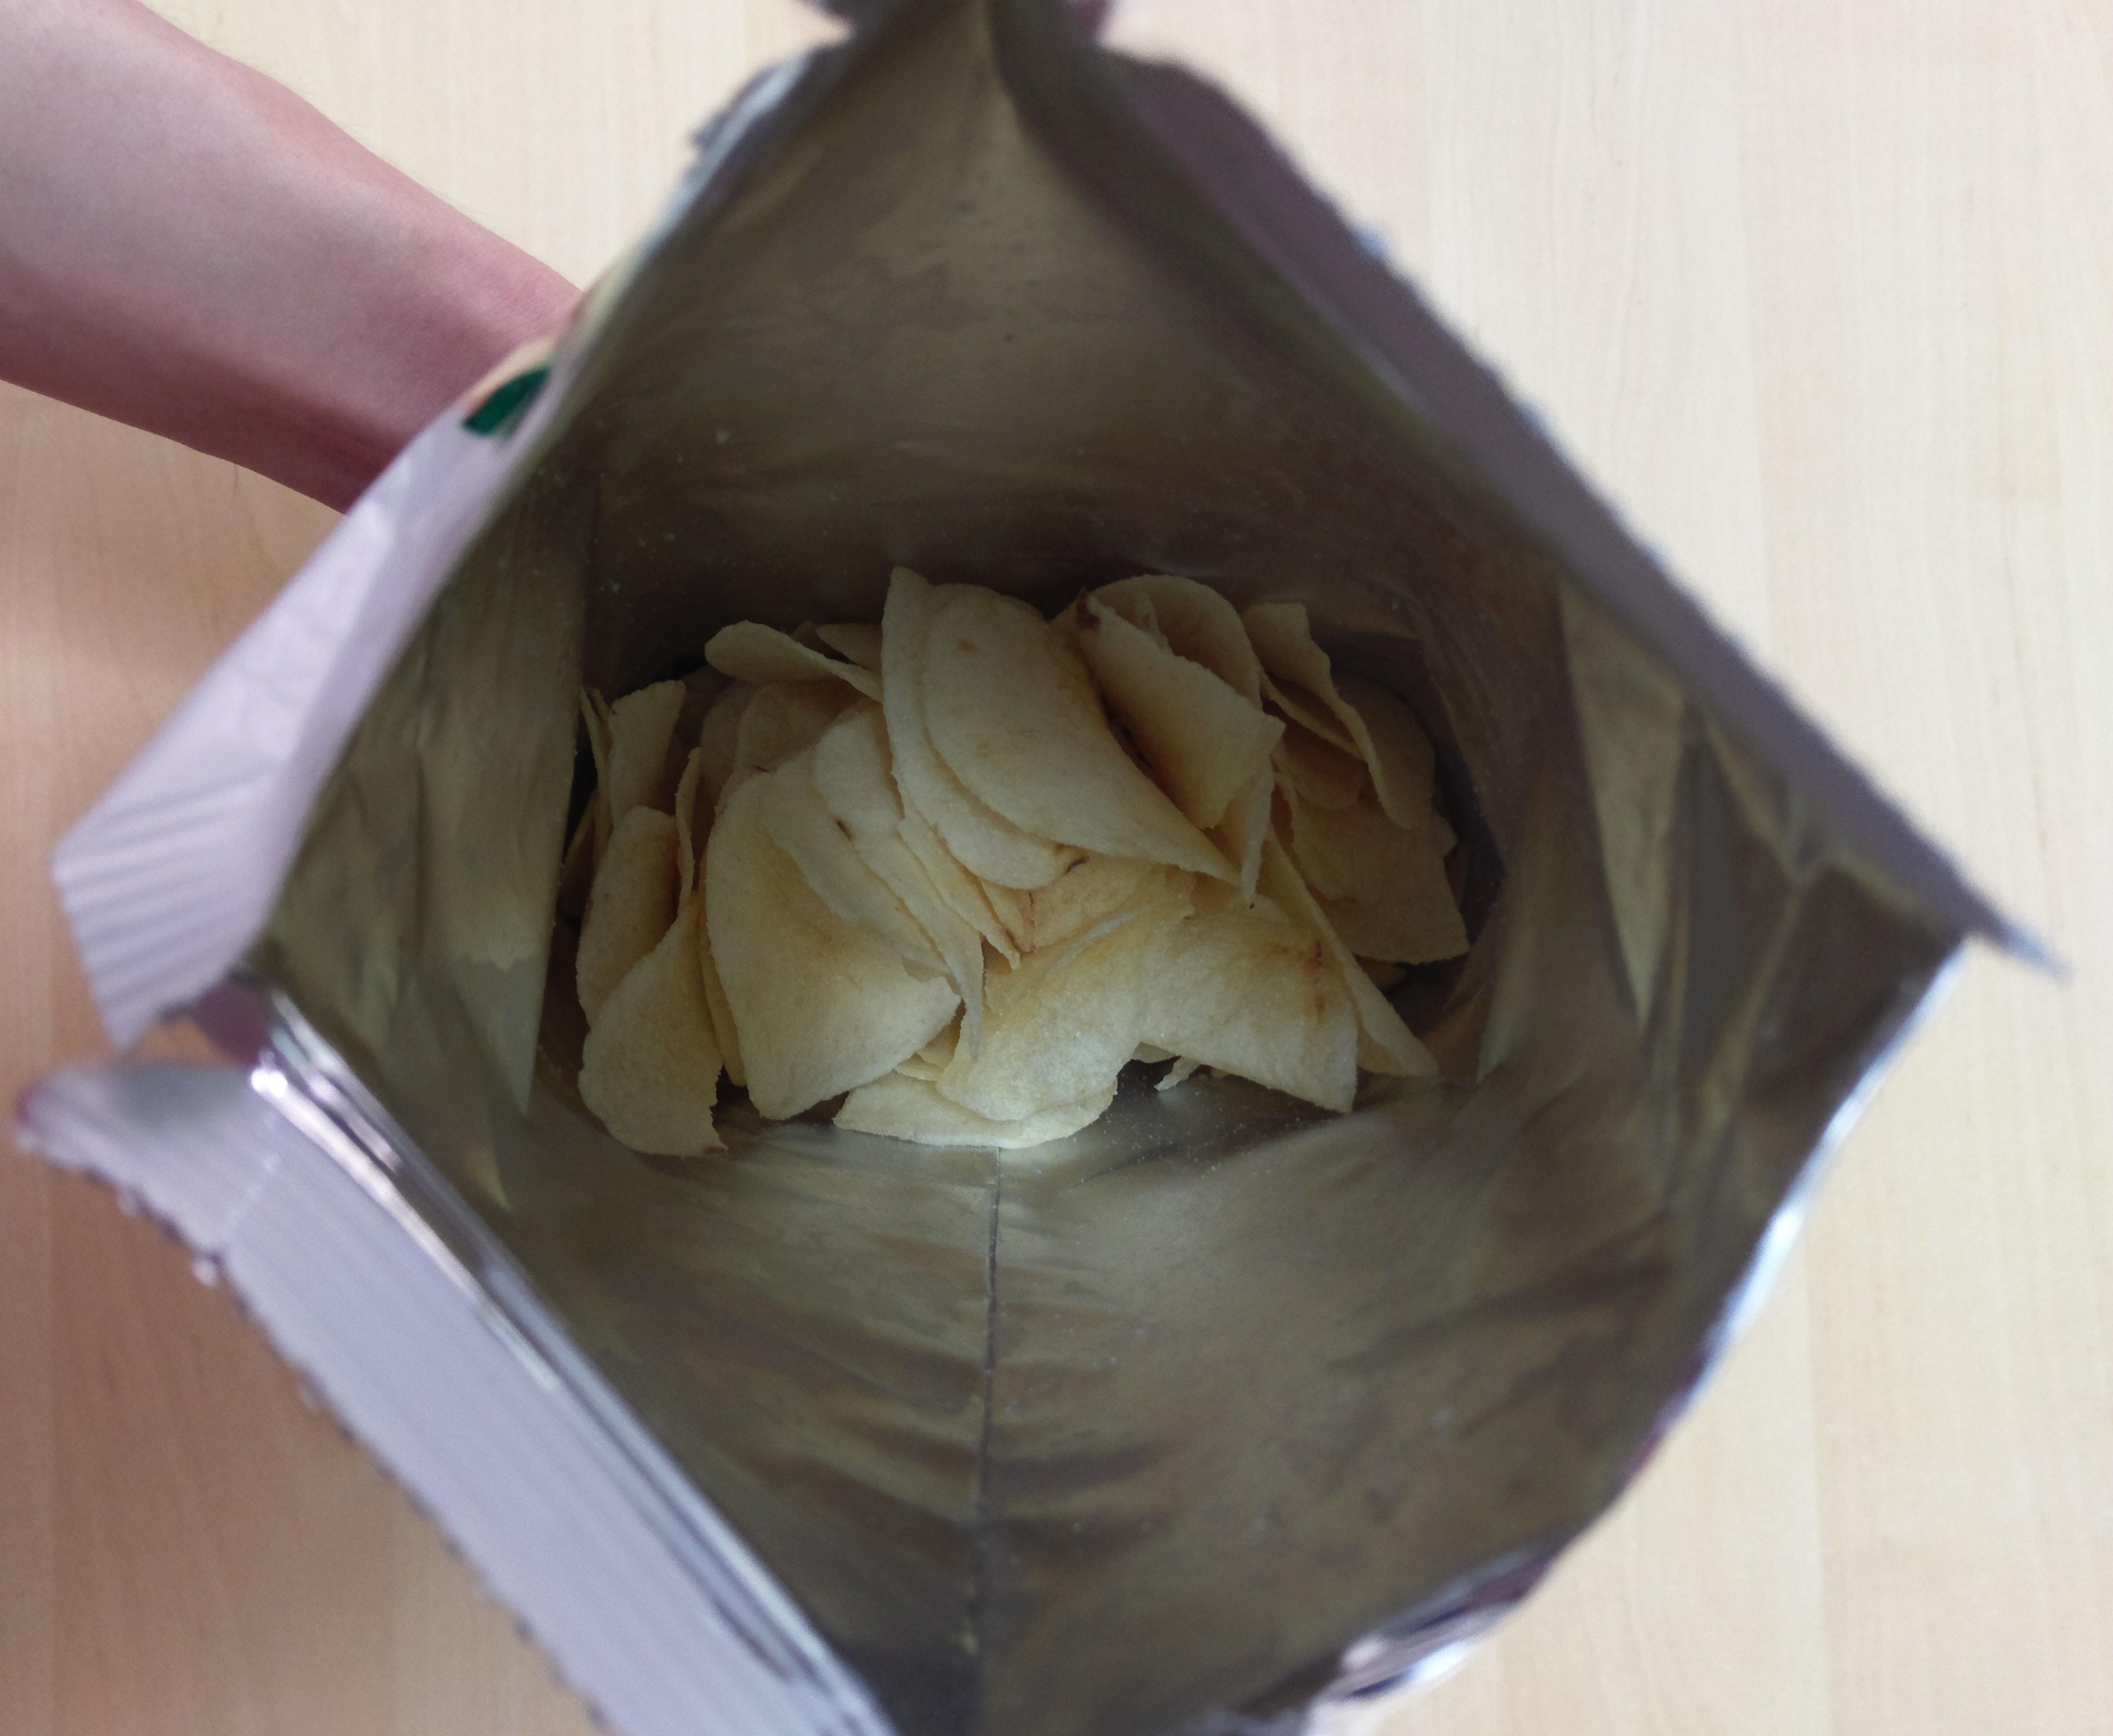 Inside the cosmos yogurt potato chip bag